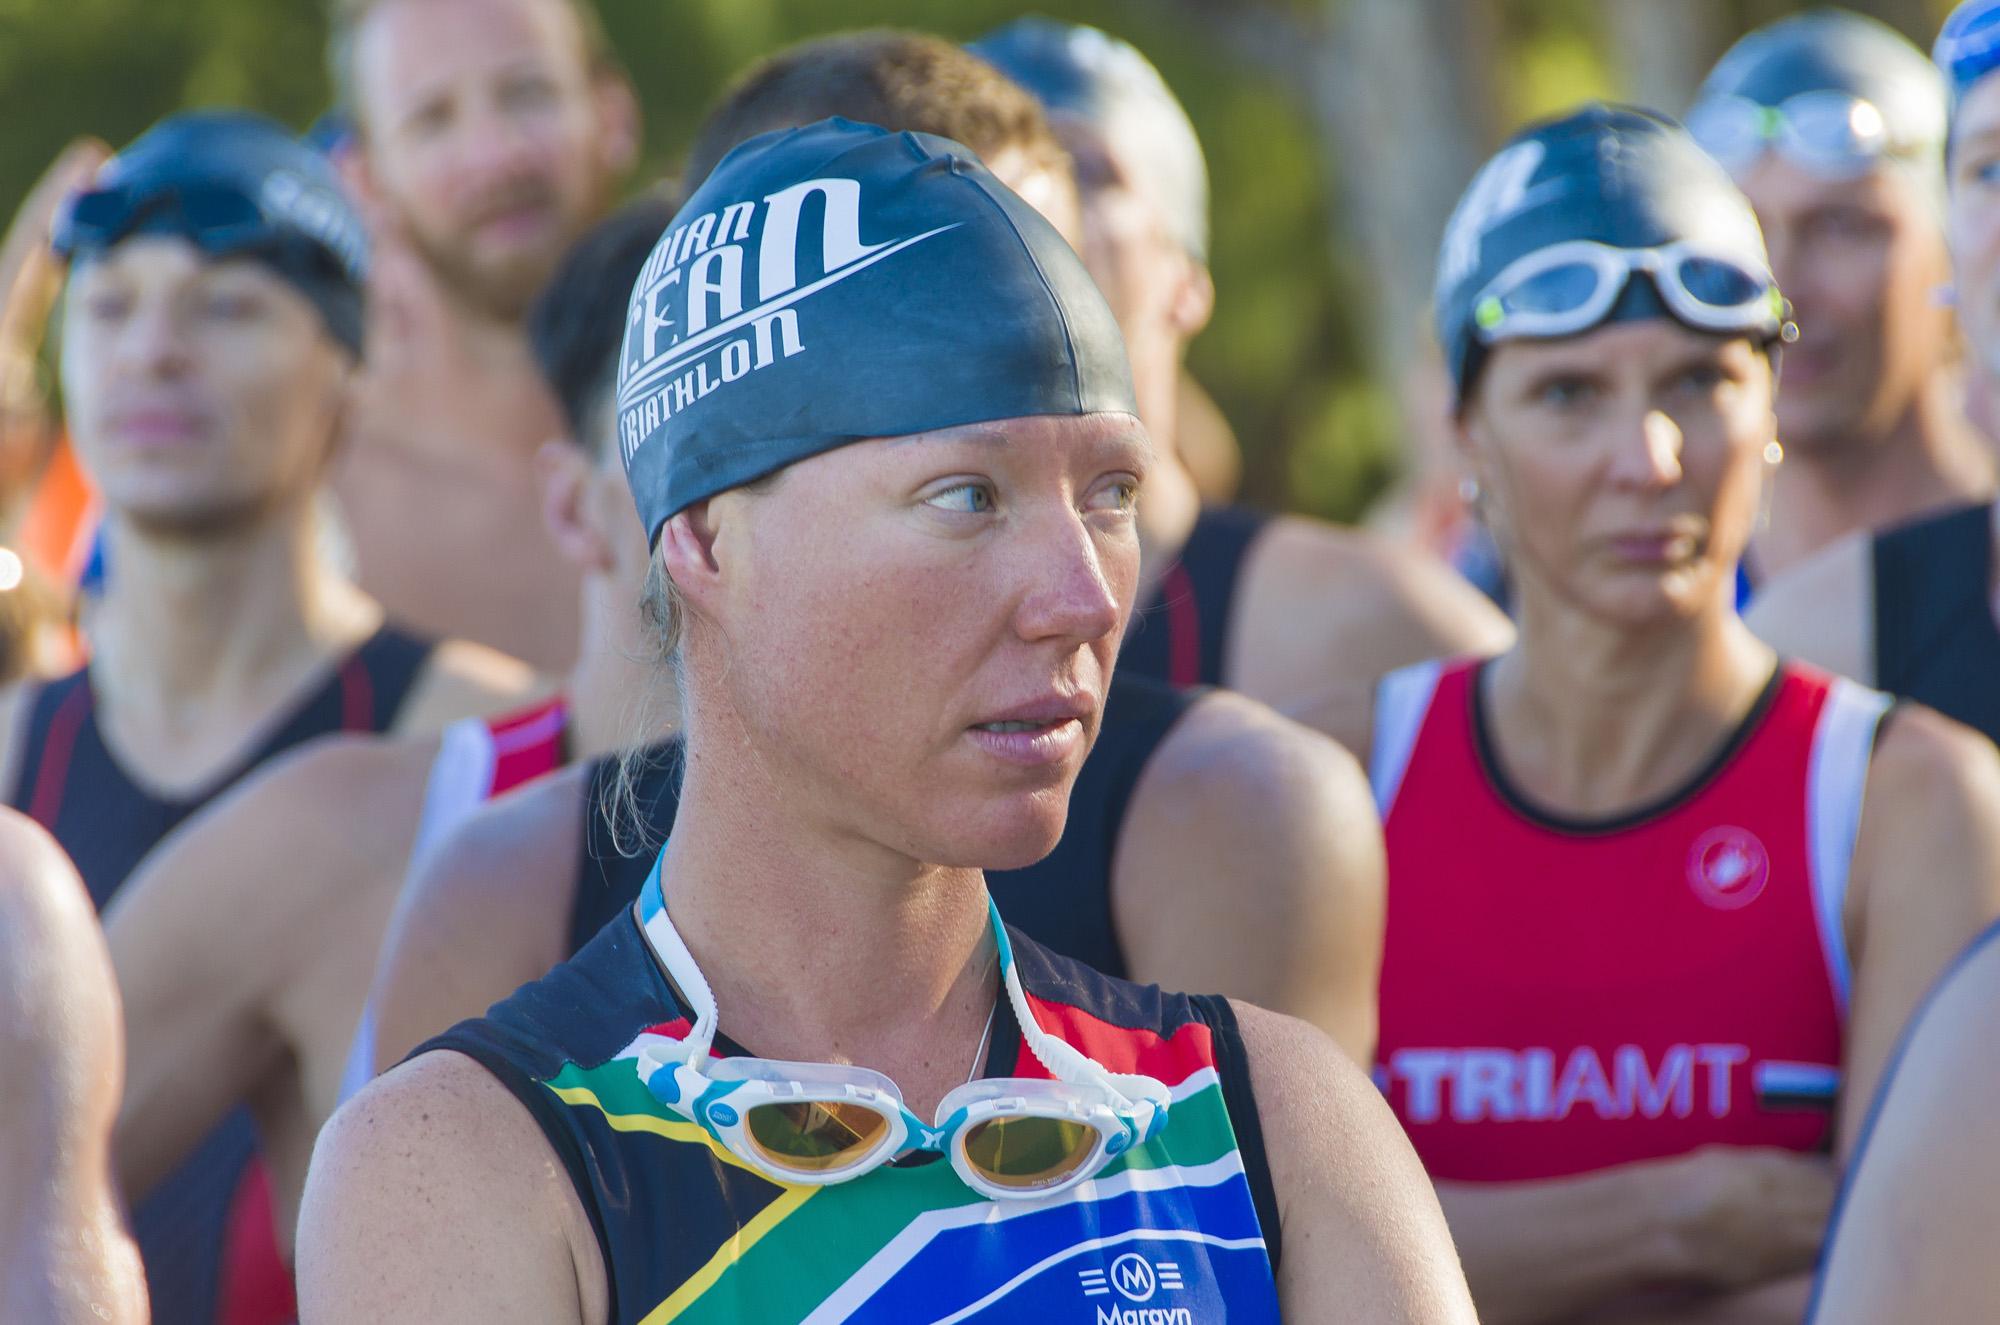 Indian Ocean Triathlon 2016-16_1.jpg